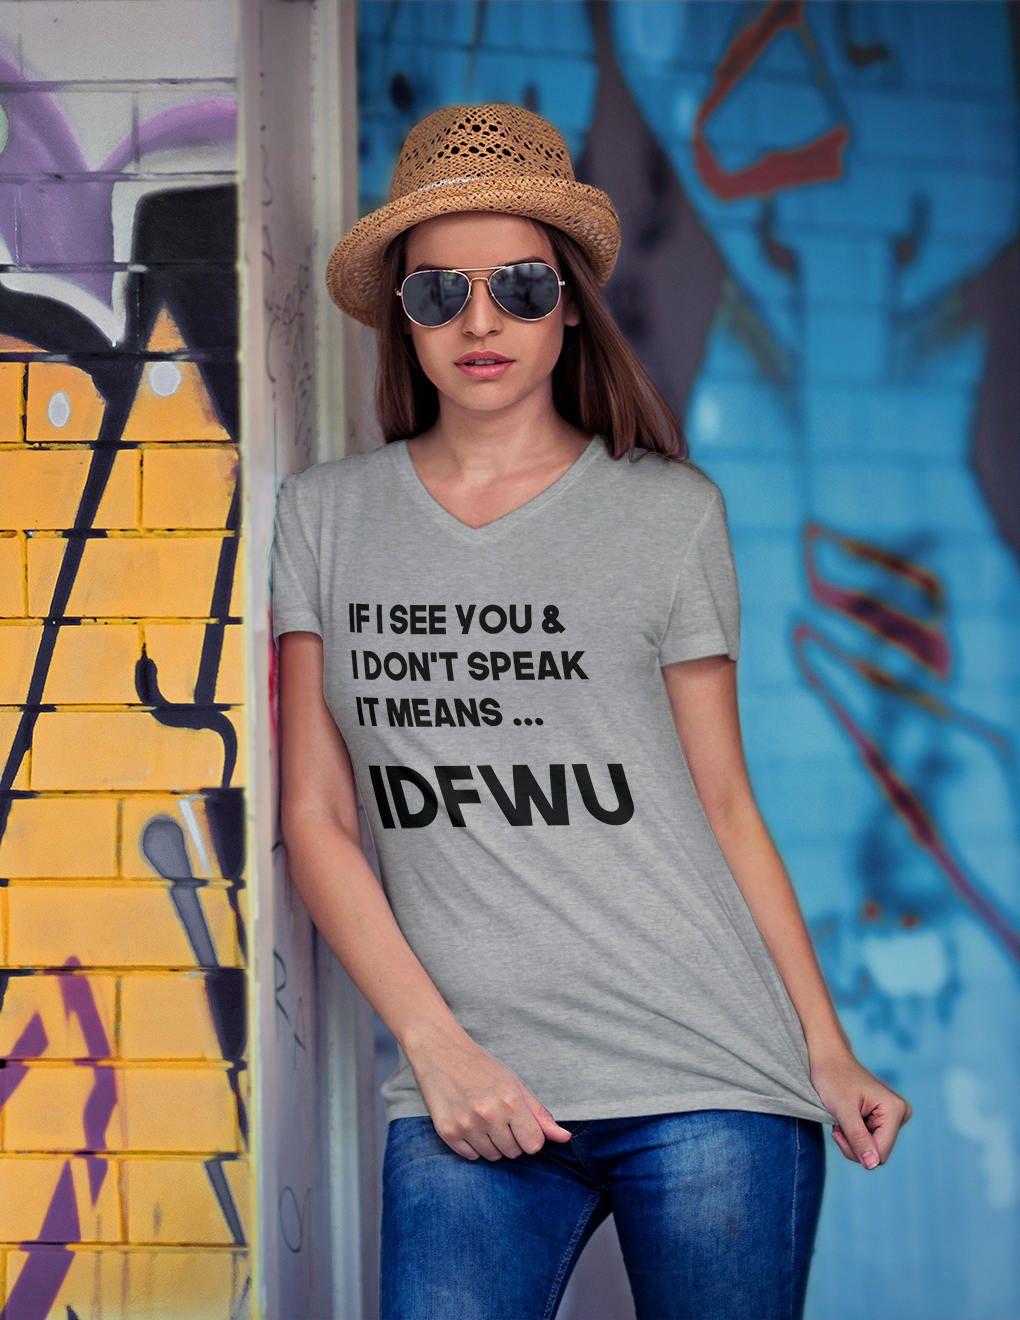 "808acee1929 Cardi B Bodak Yellow  Womens Graphic Tee Shirts   ""If I see you… IDFWU""   Quote Shirts  Funny tshirts  18  tee  shirts  tshirts  quoteshirts   graphictshirts ..."